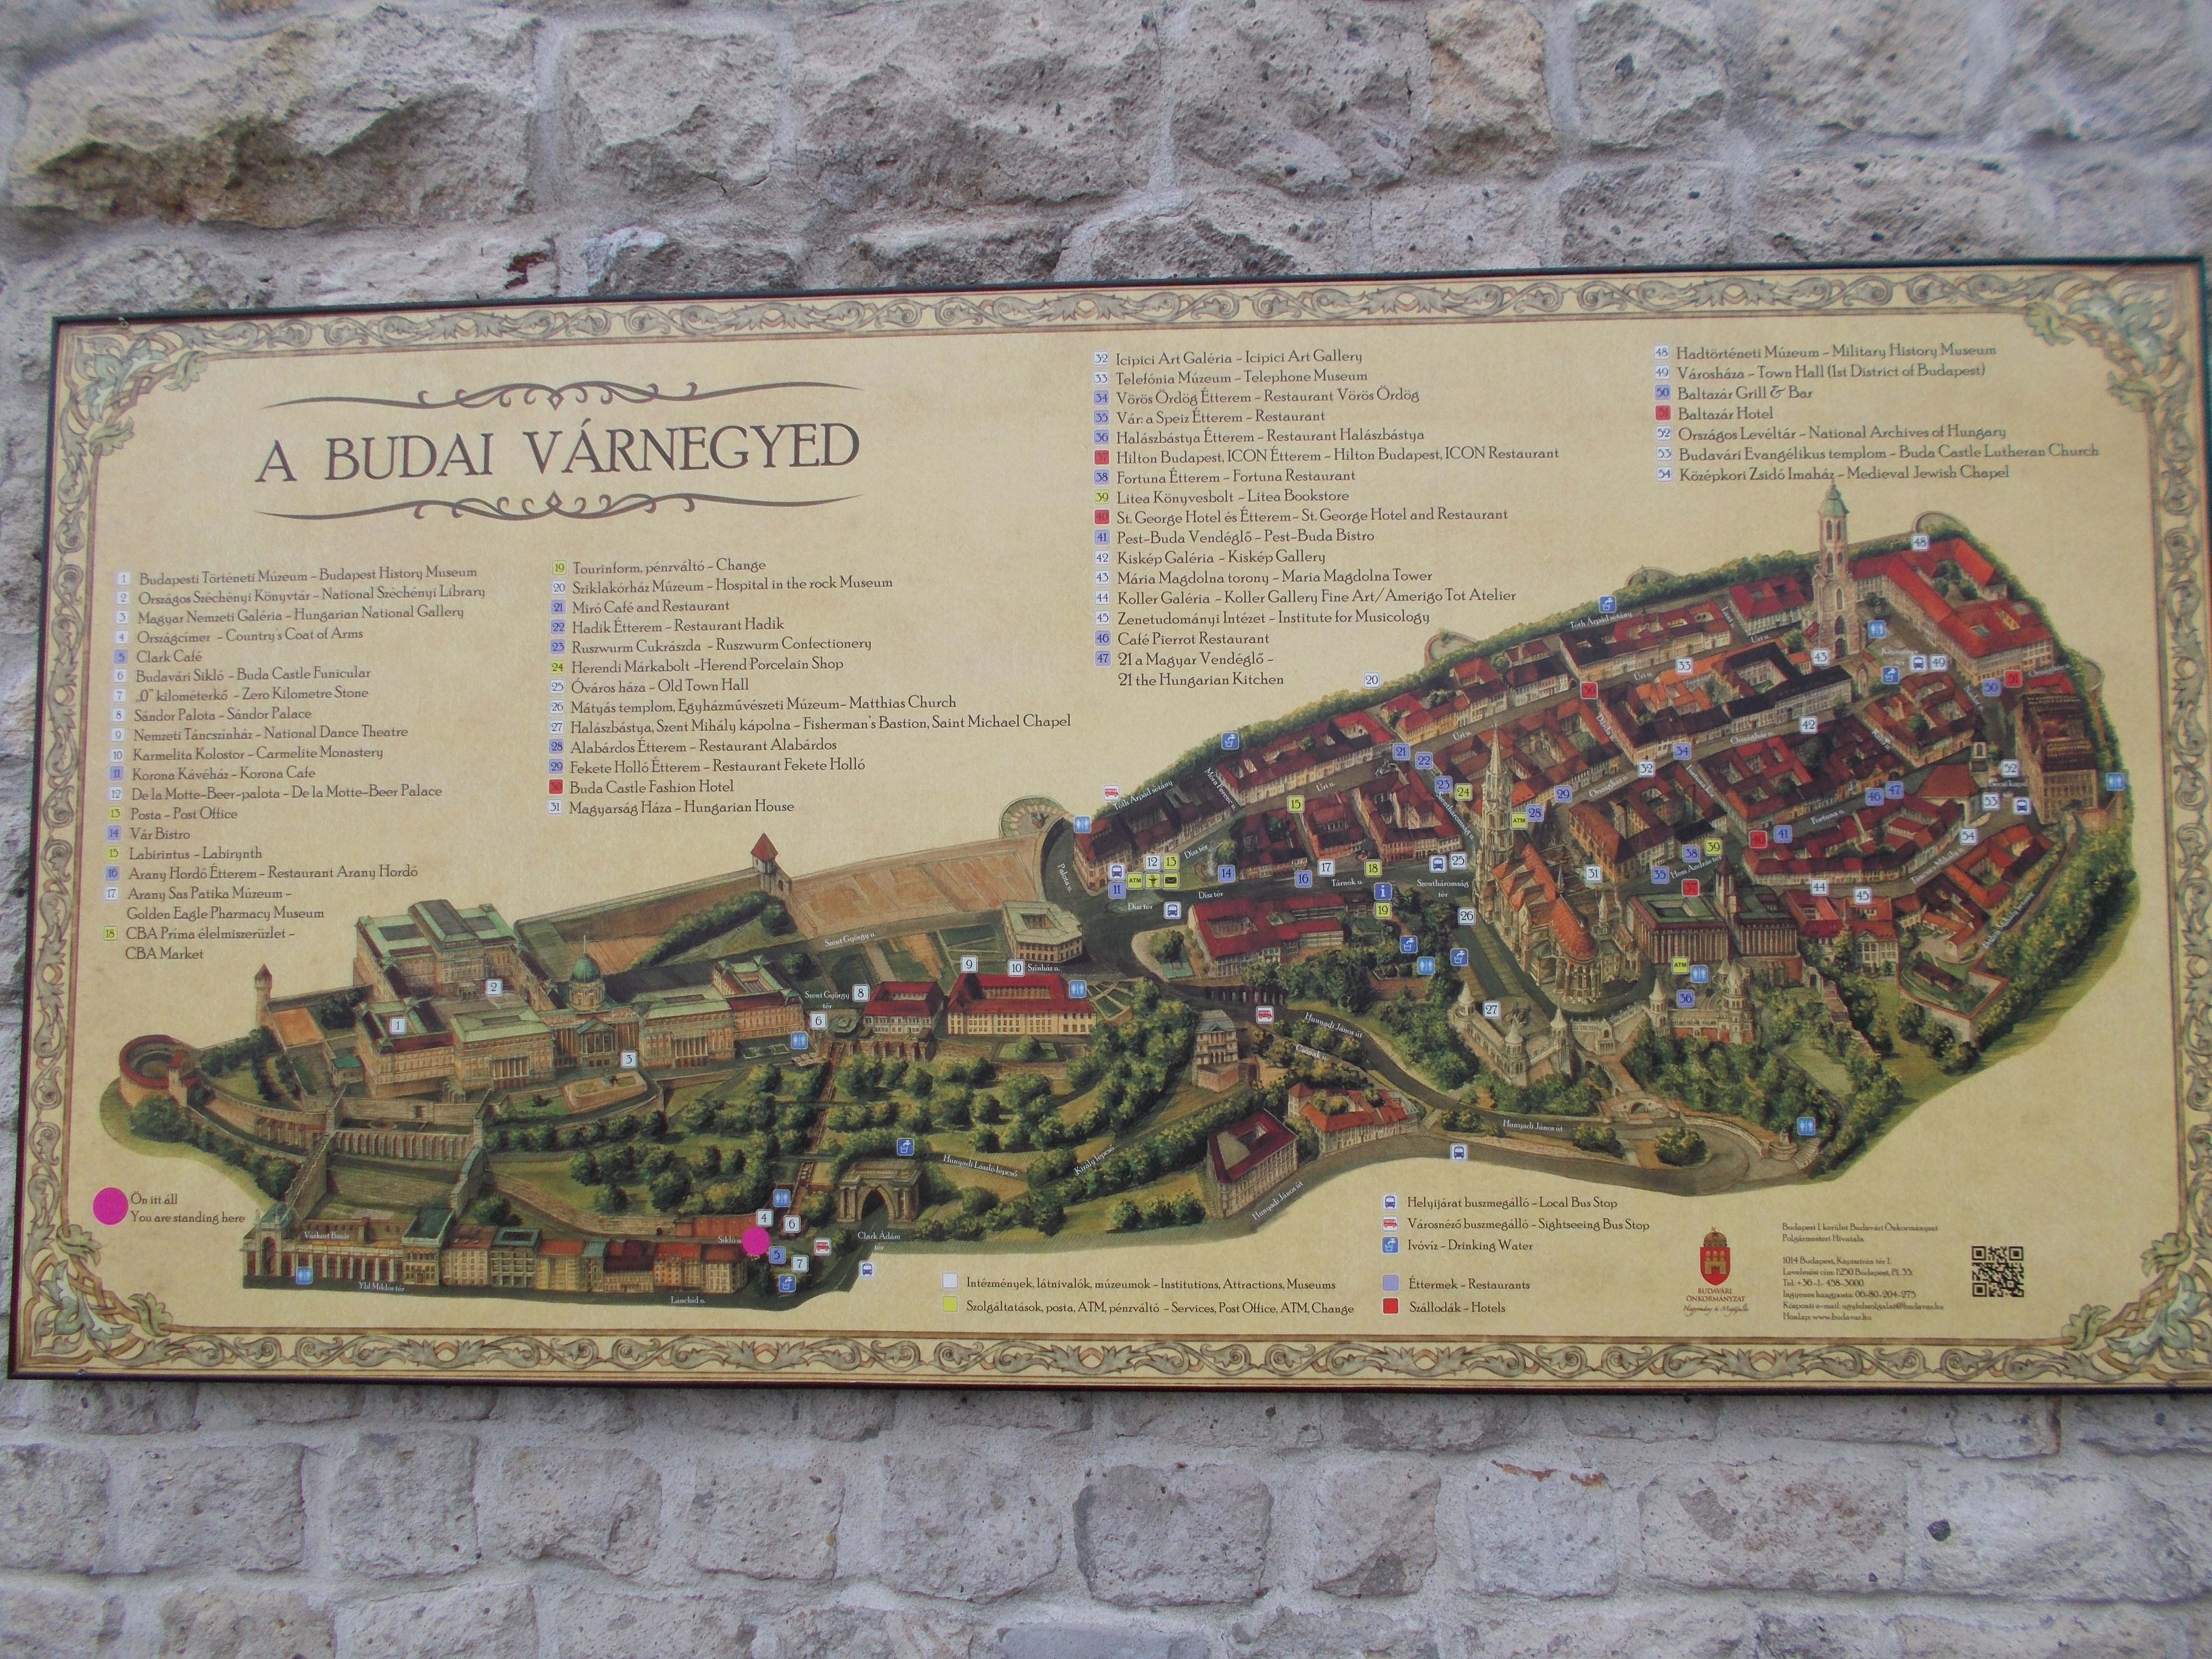 Hungary Castles Map images Explore Buda Castle